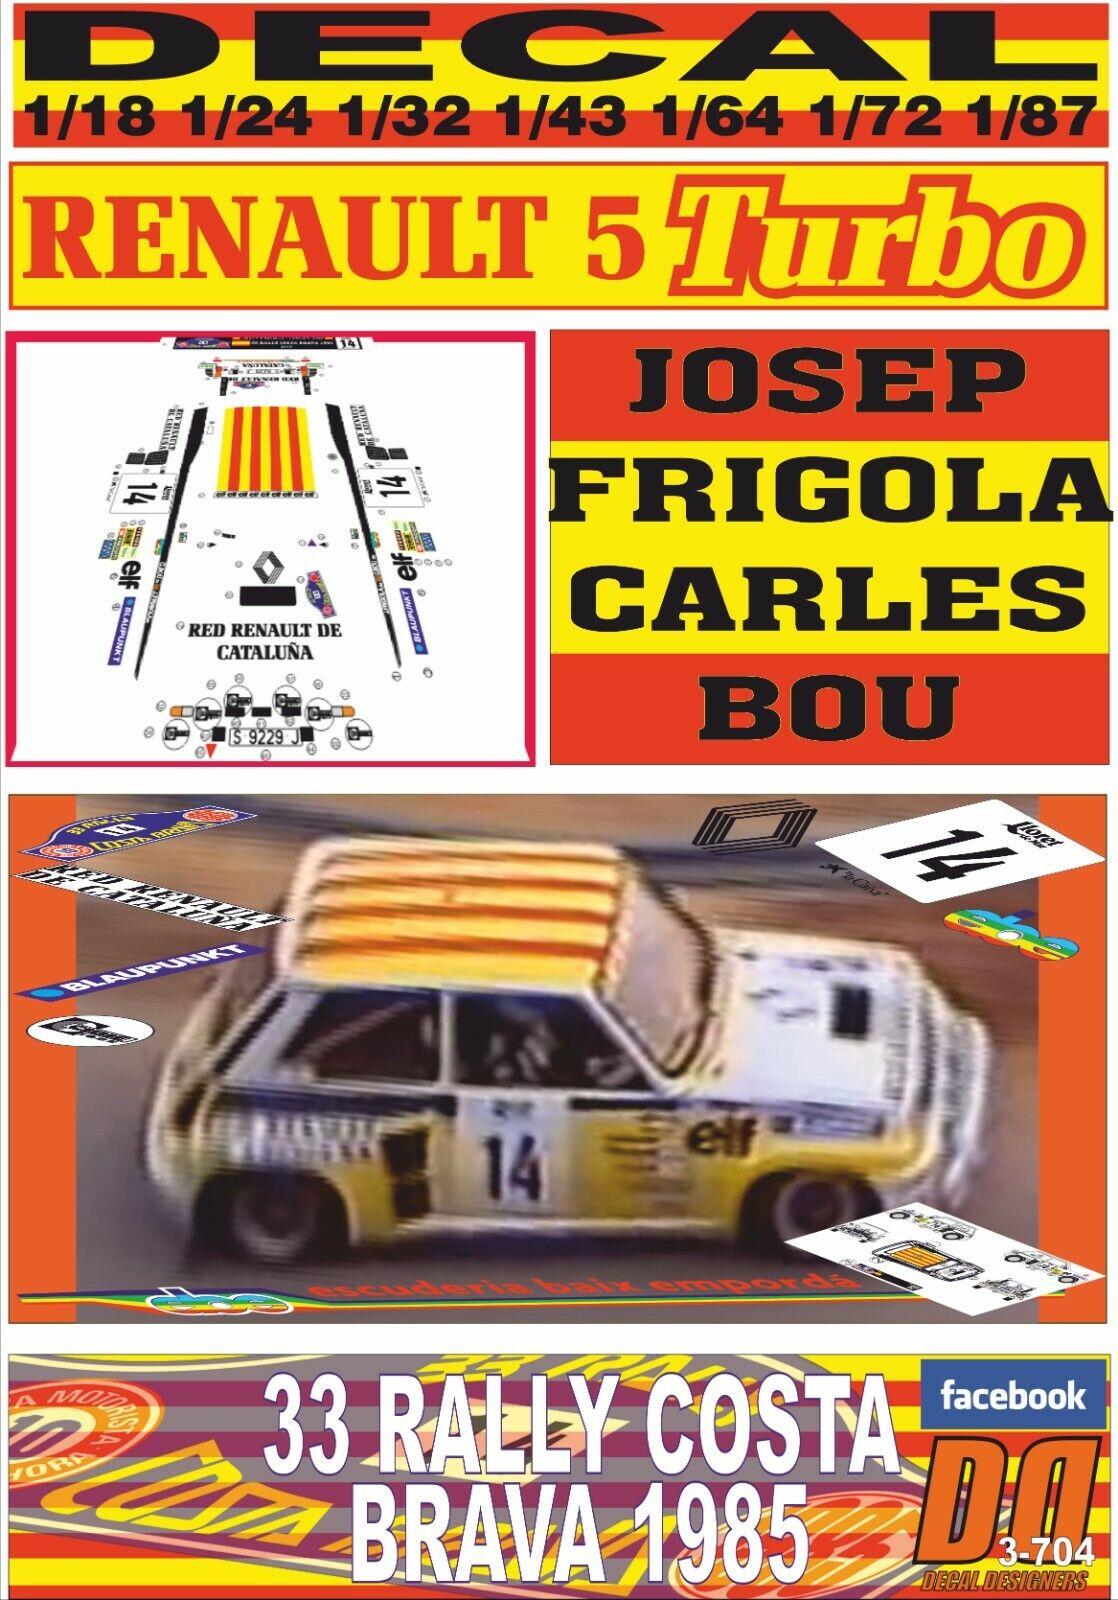 DECAL RENAULT 5 TURBO J.FRIGOLA R. COSTA BRAVA 1985 DnF (08)